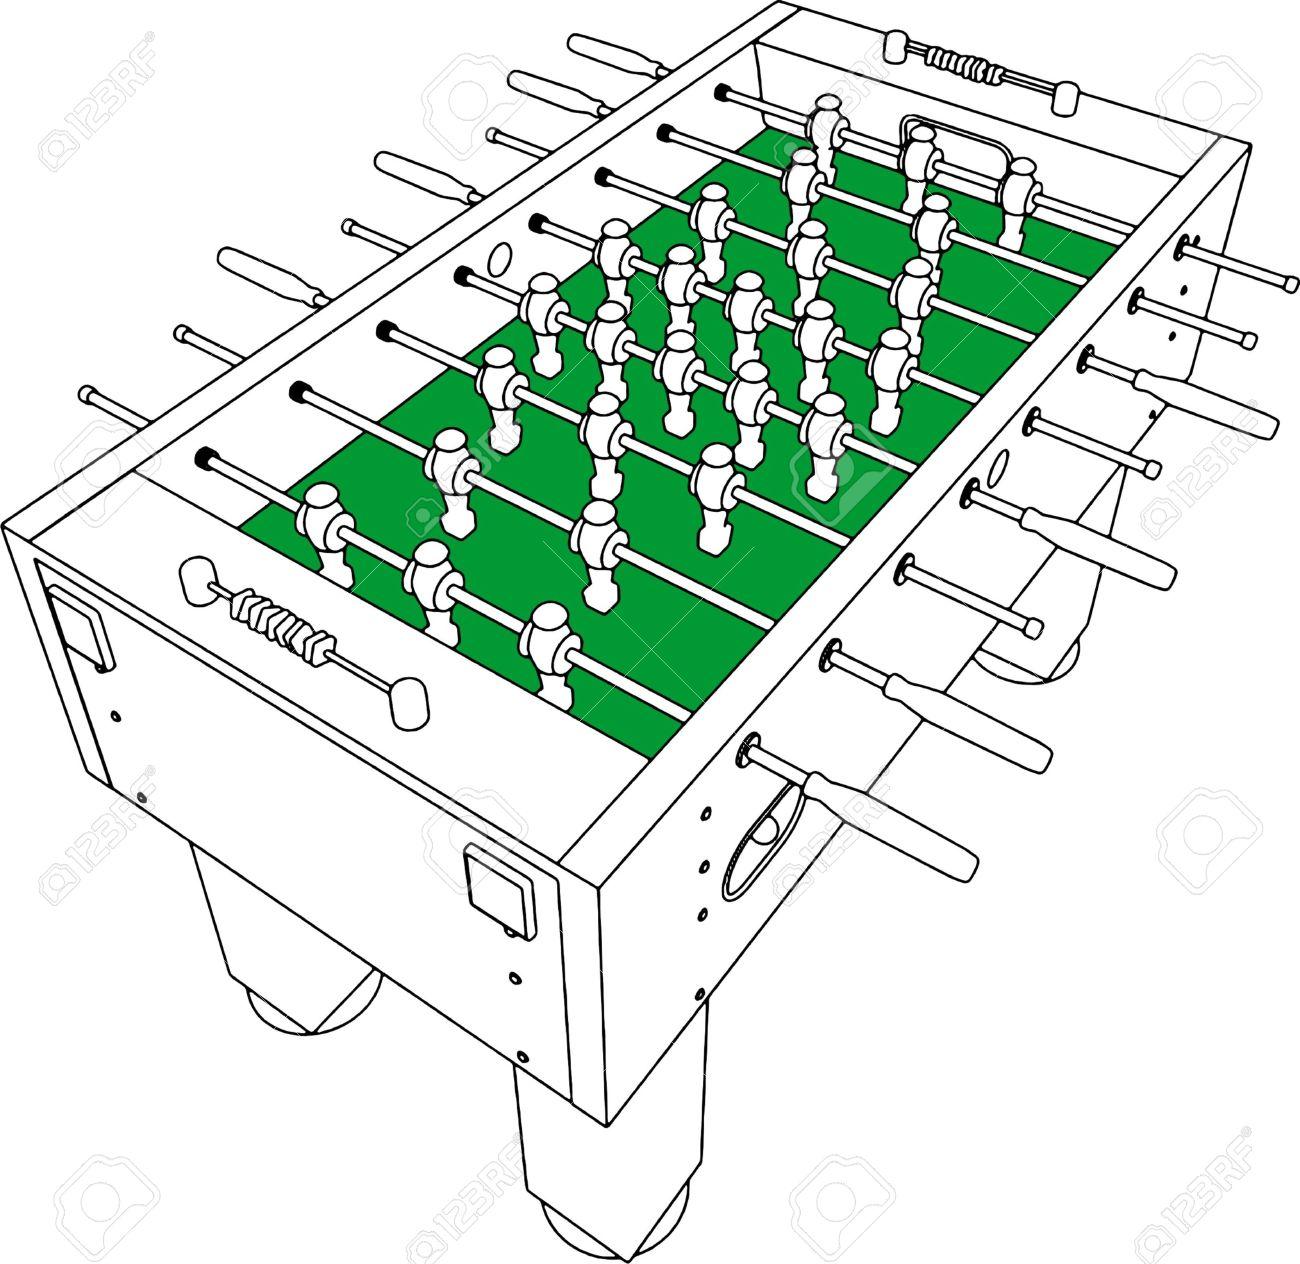 Foosball table clipart.